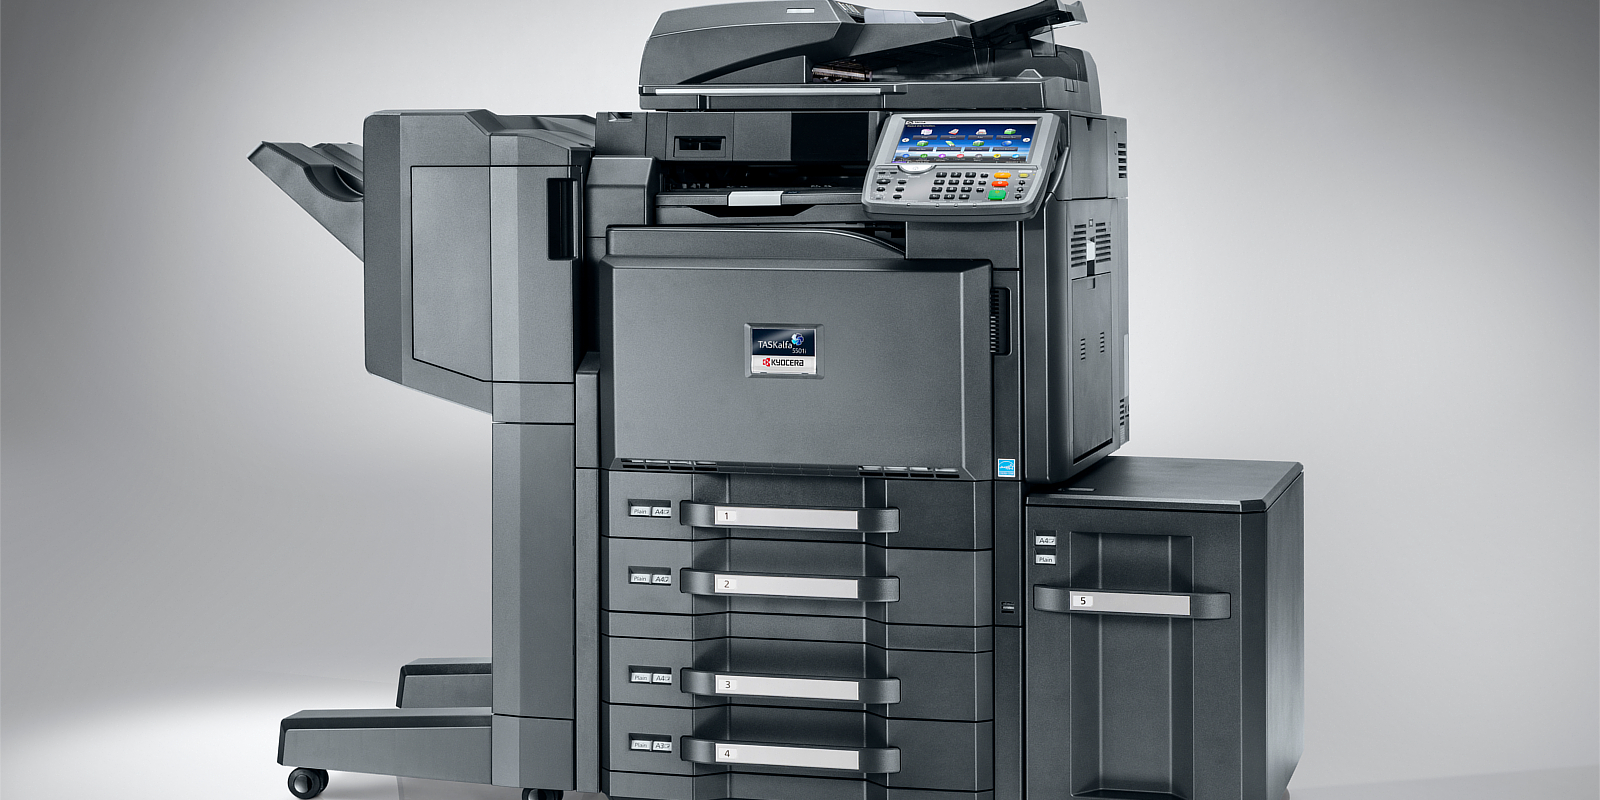 Echipamente multifunctionale laser color Kyocera prin Romsystem.ro